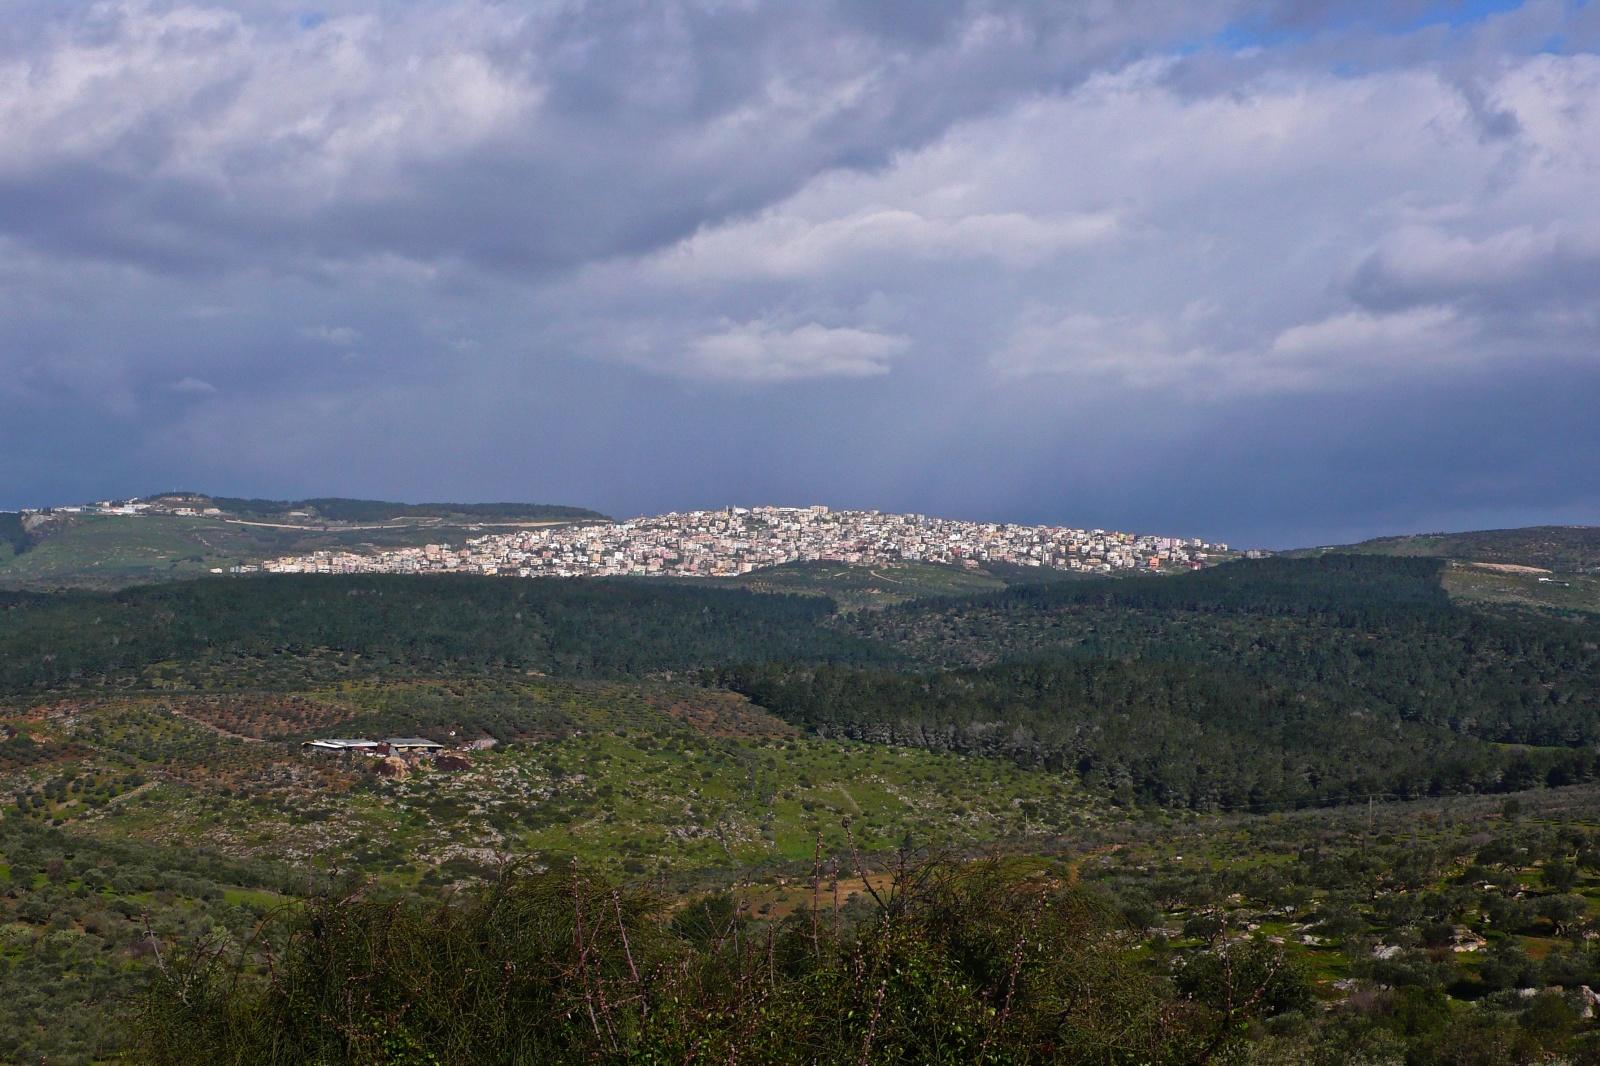 Israele - Dal monte Tabor